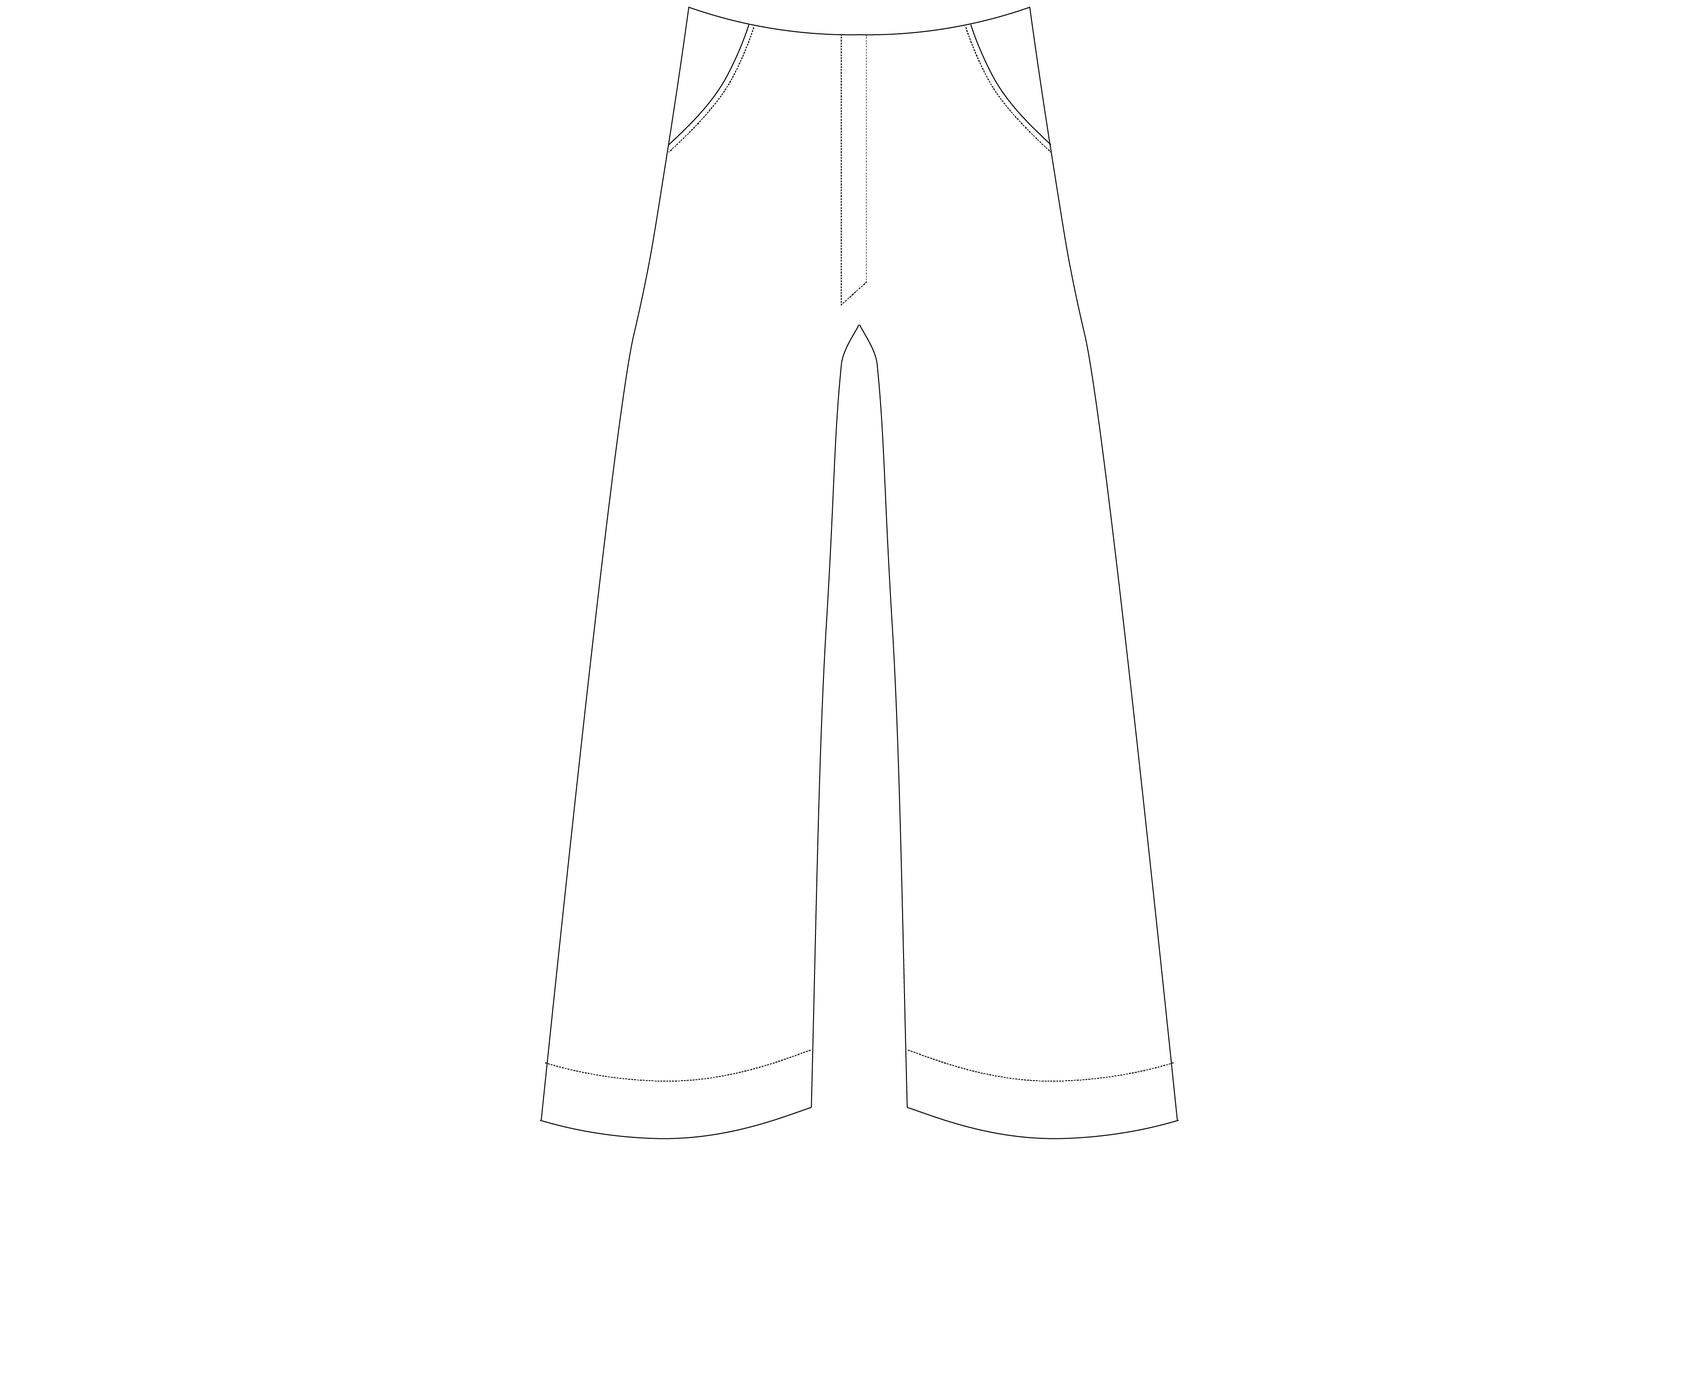 UNC design templates-06.png